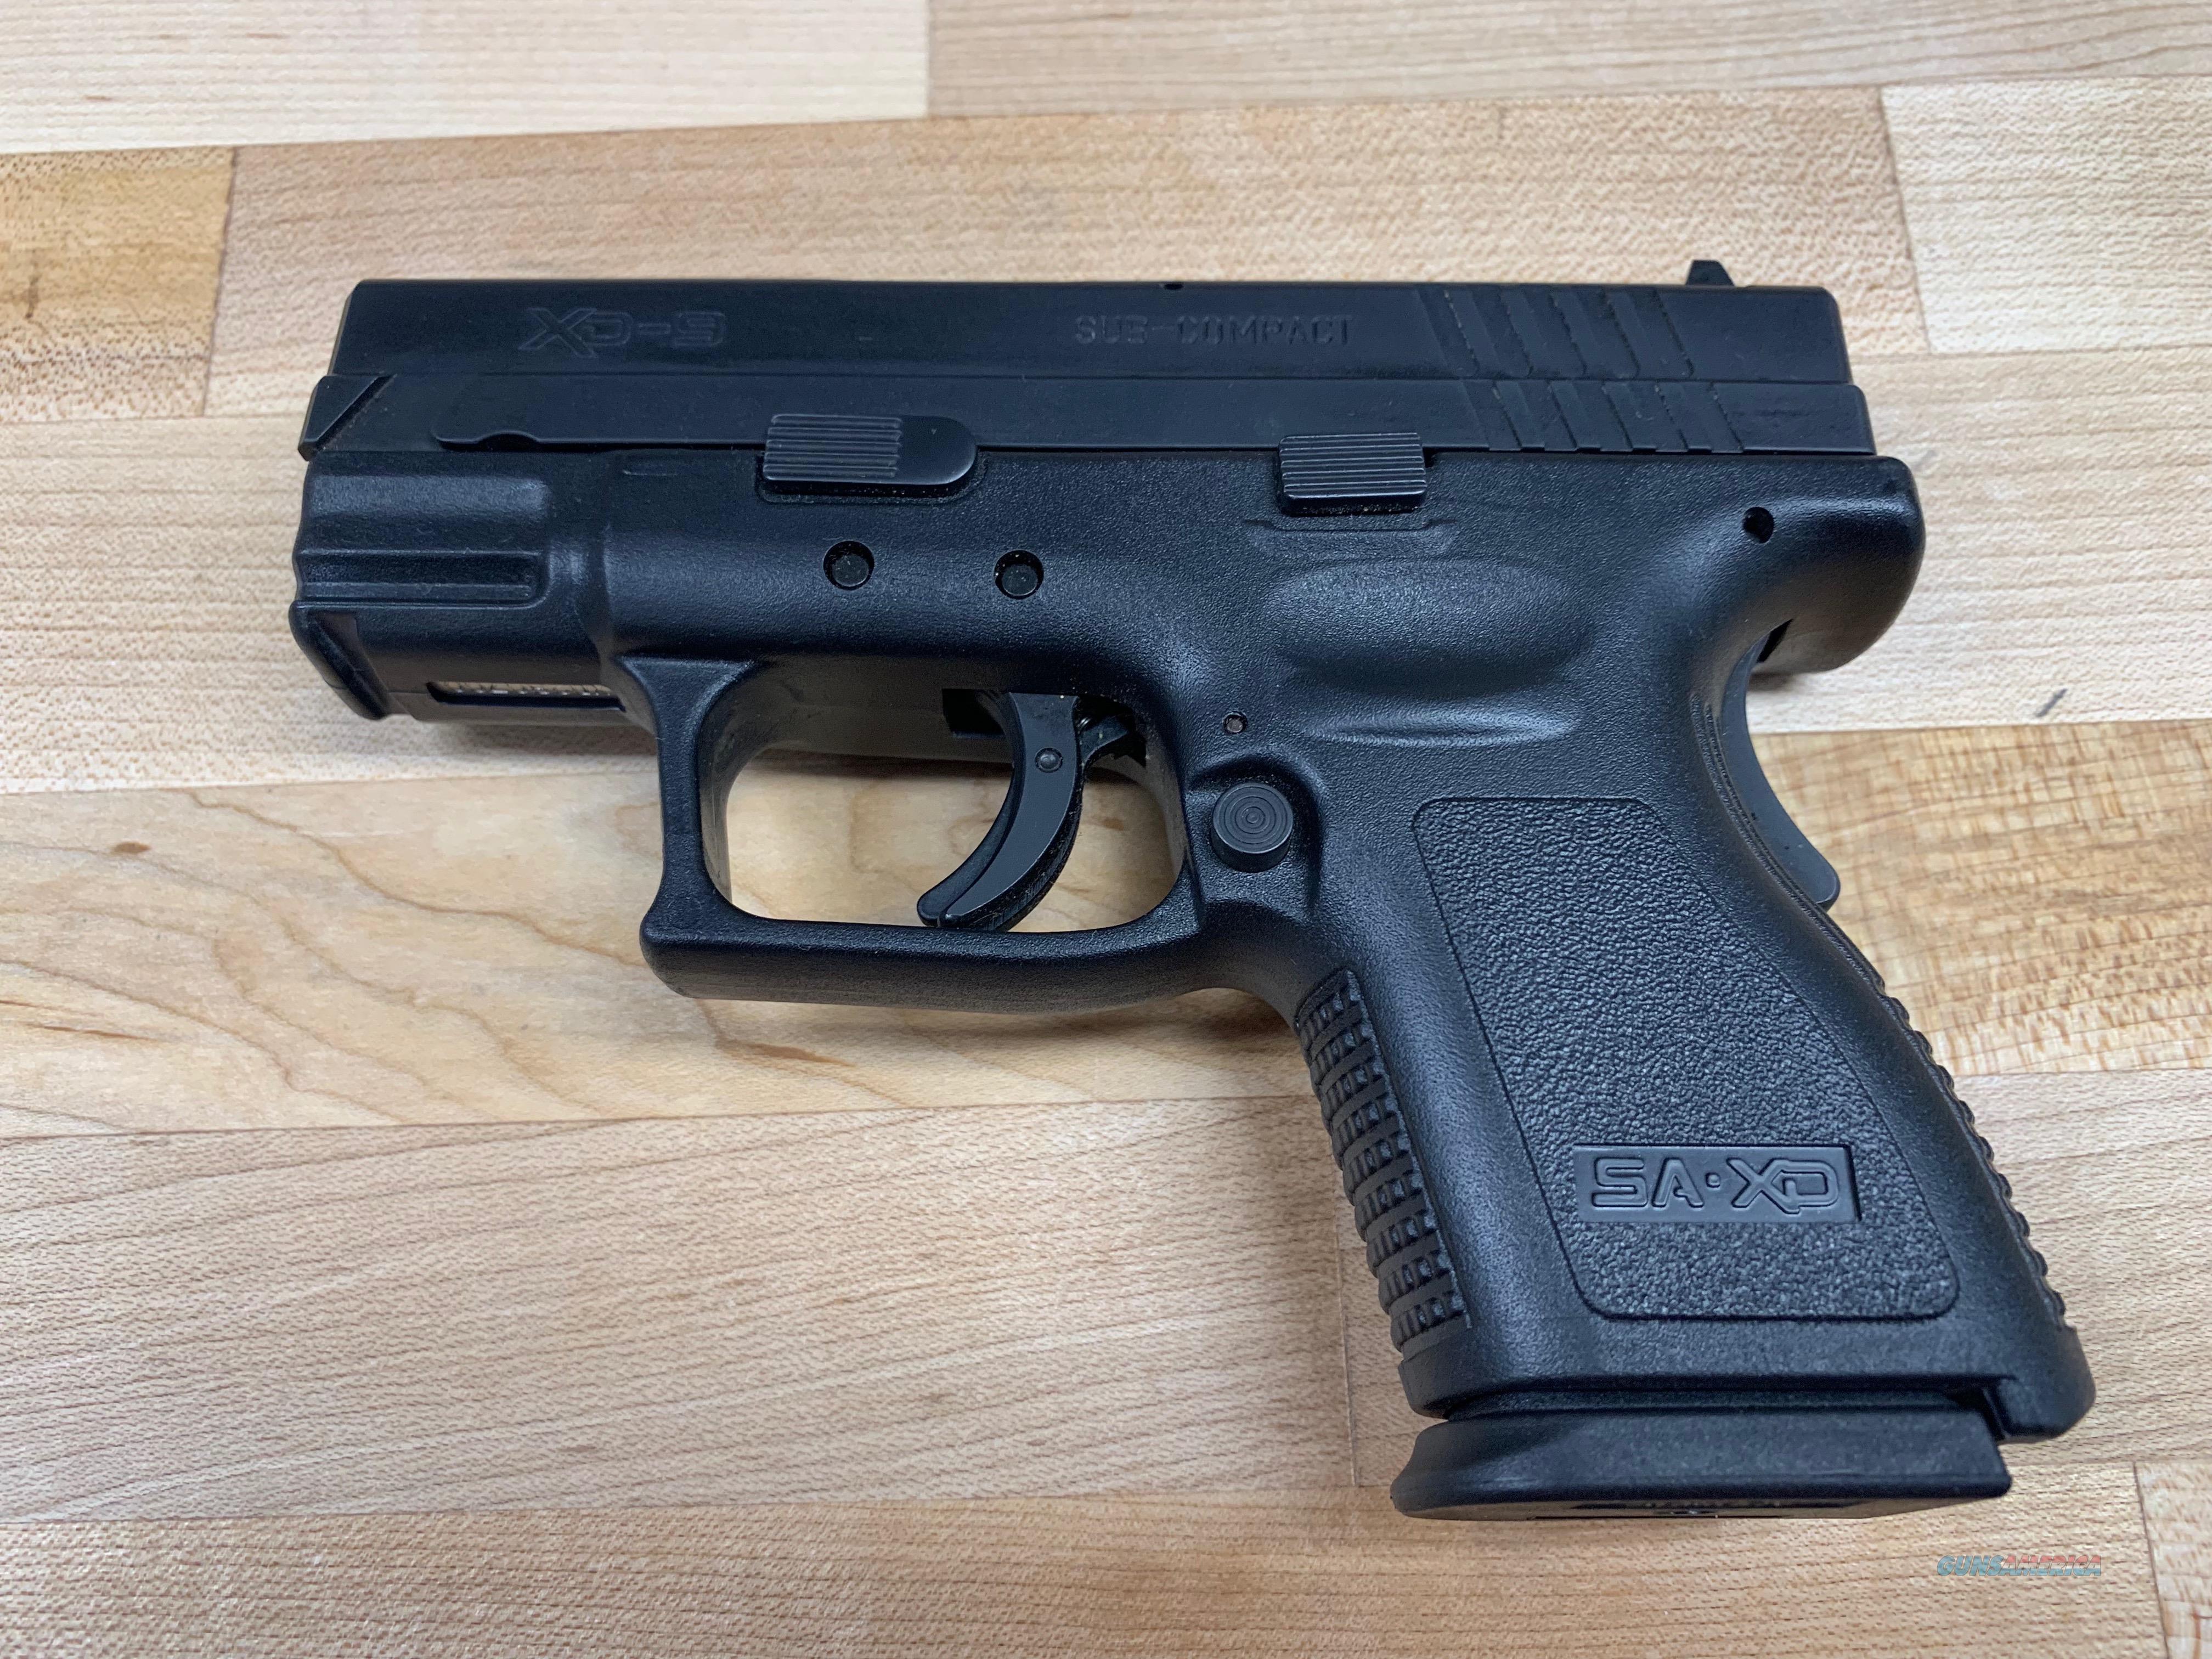 Springfield Armory XD9801HCSPO6   Guns > Pistols > Springfield Armory Pistols > XD (eXtreme Duty)